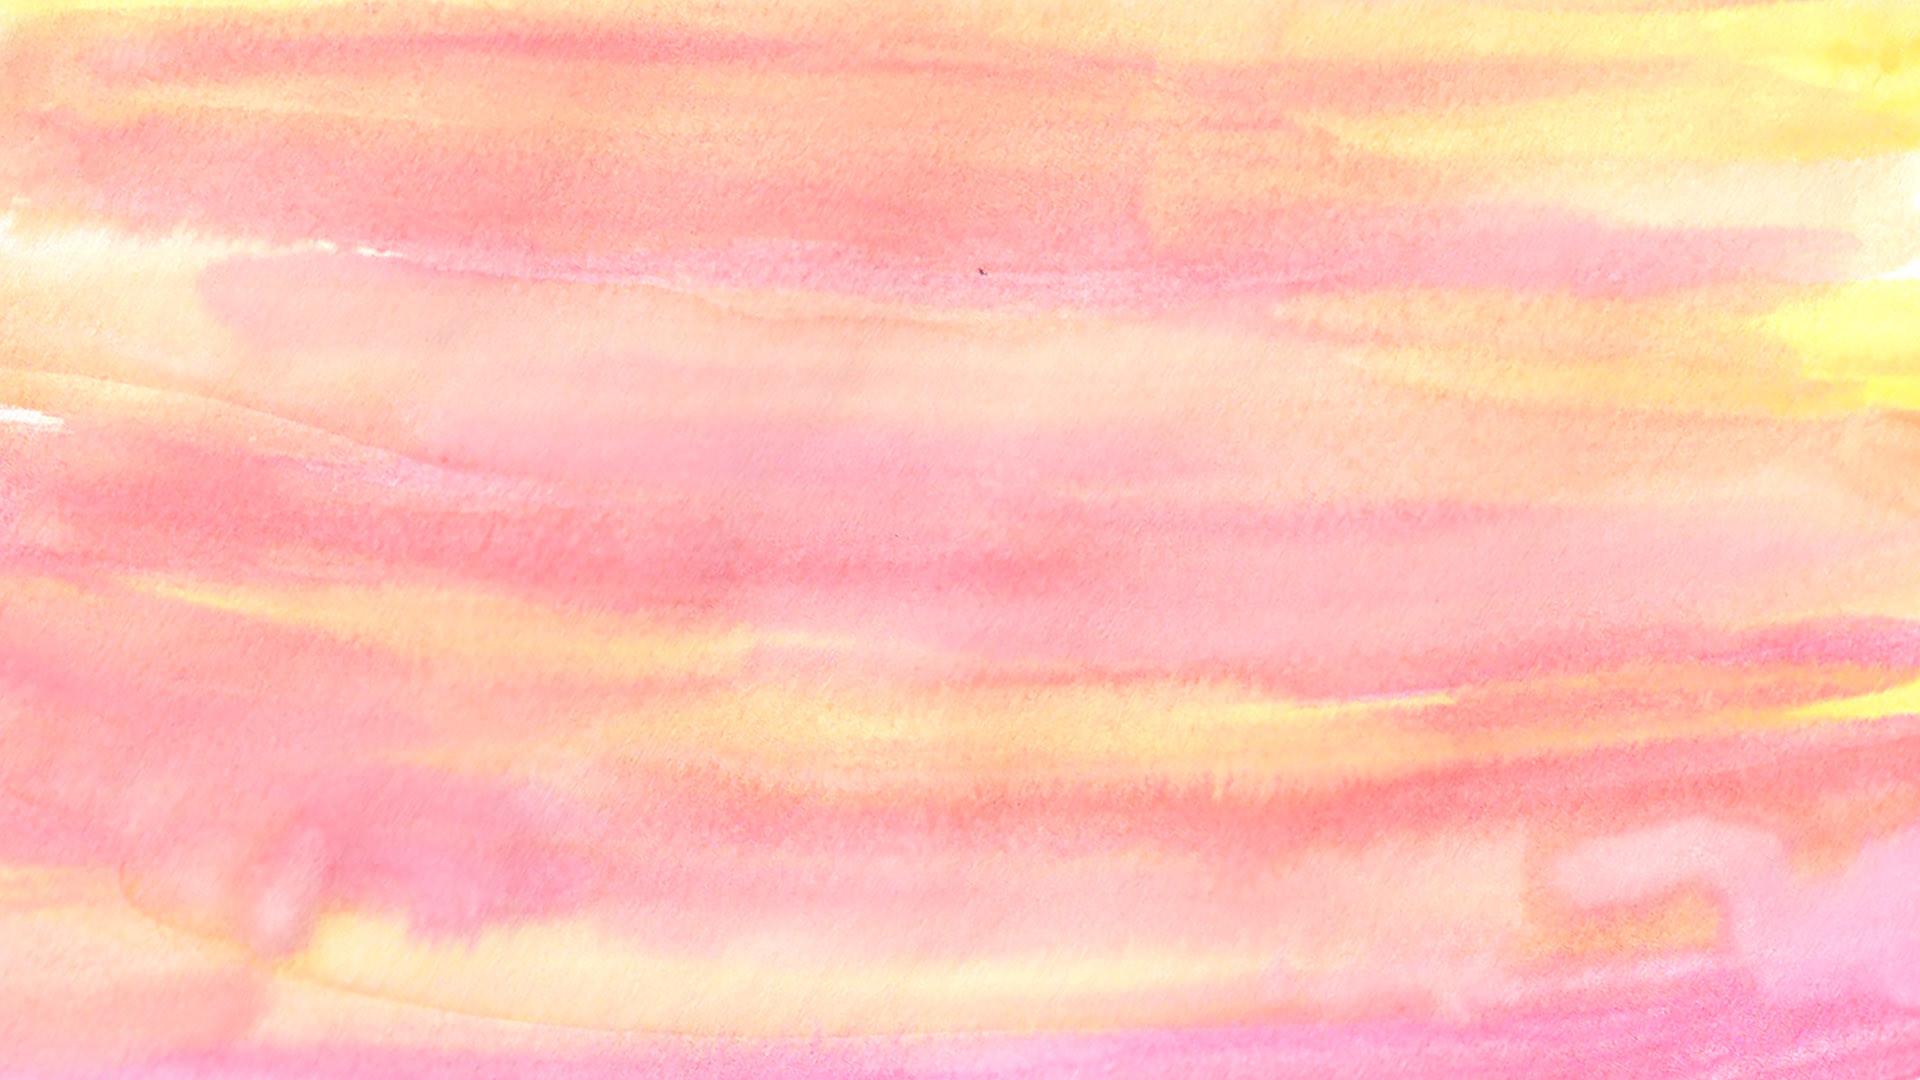 Rose Gold Computer Wallpaper Tumblr